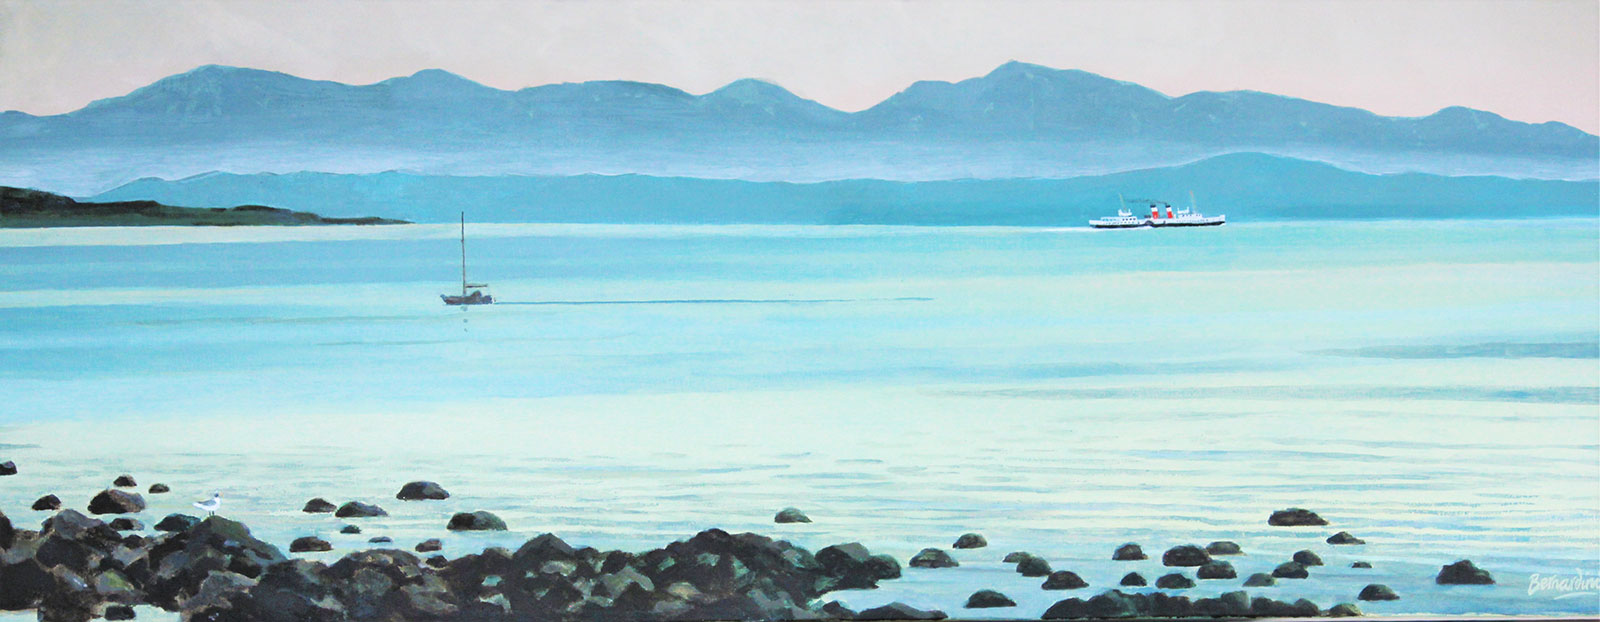 Jeannie-Deans-Painting-1